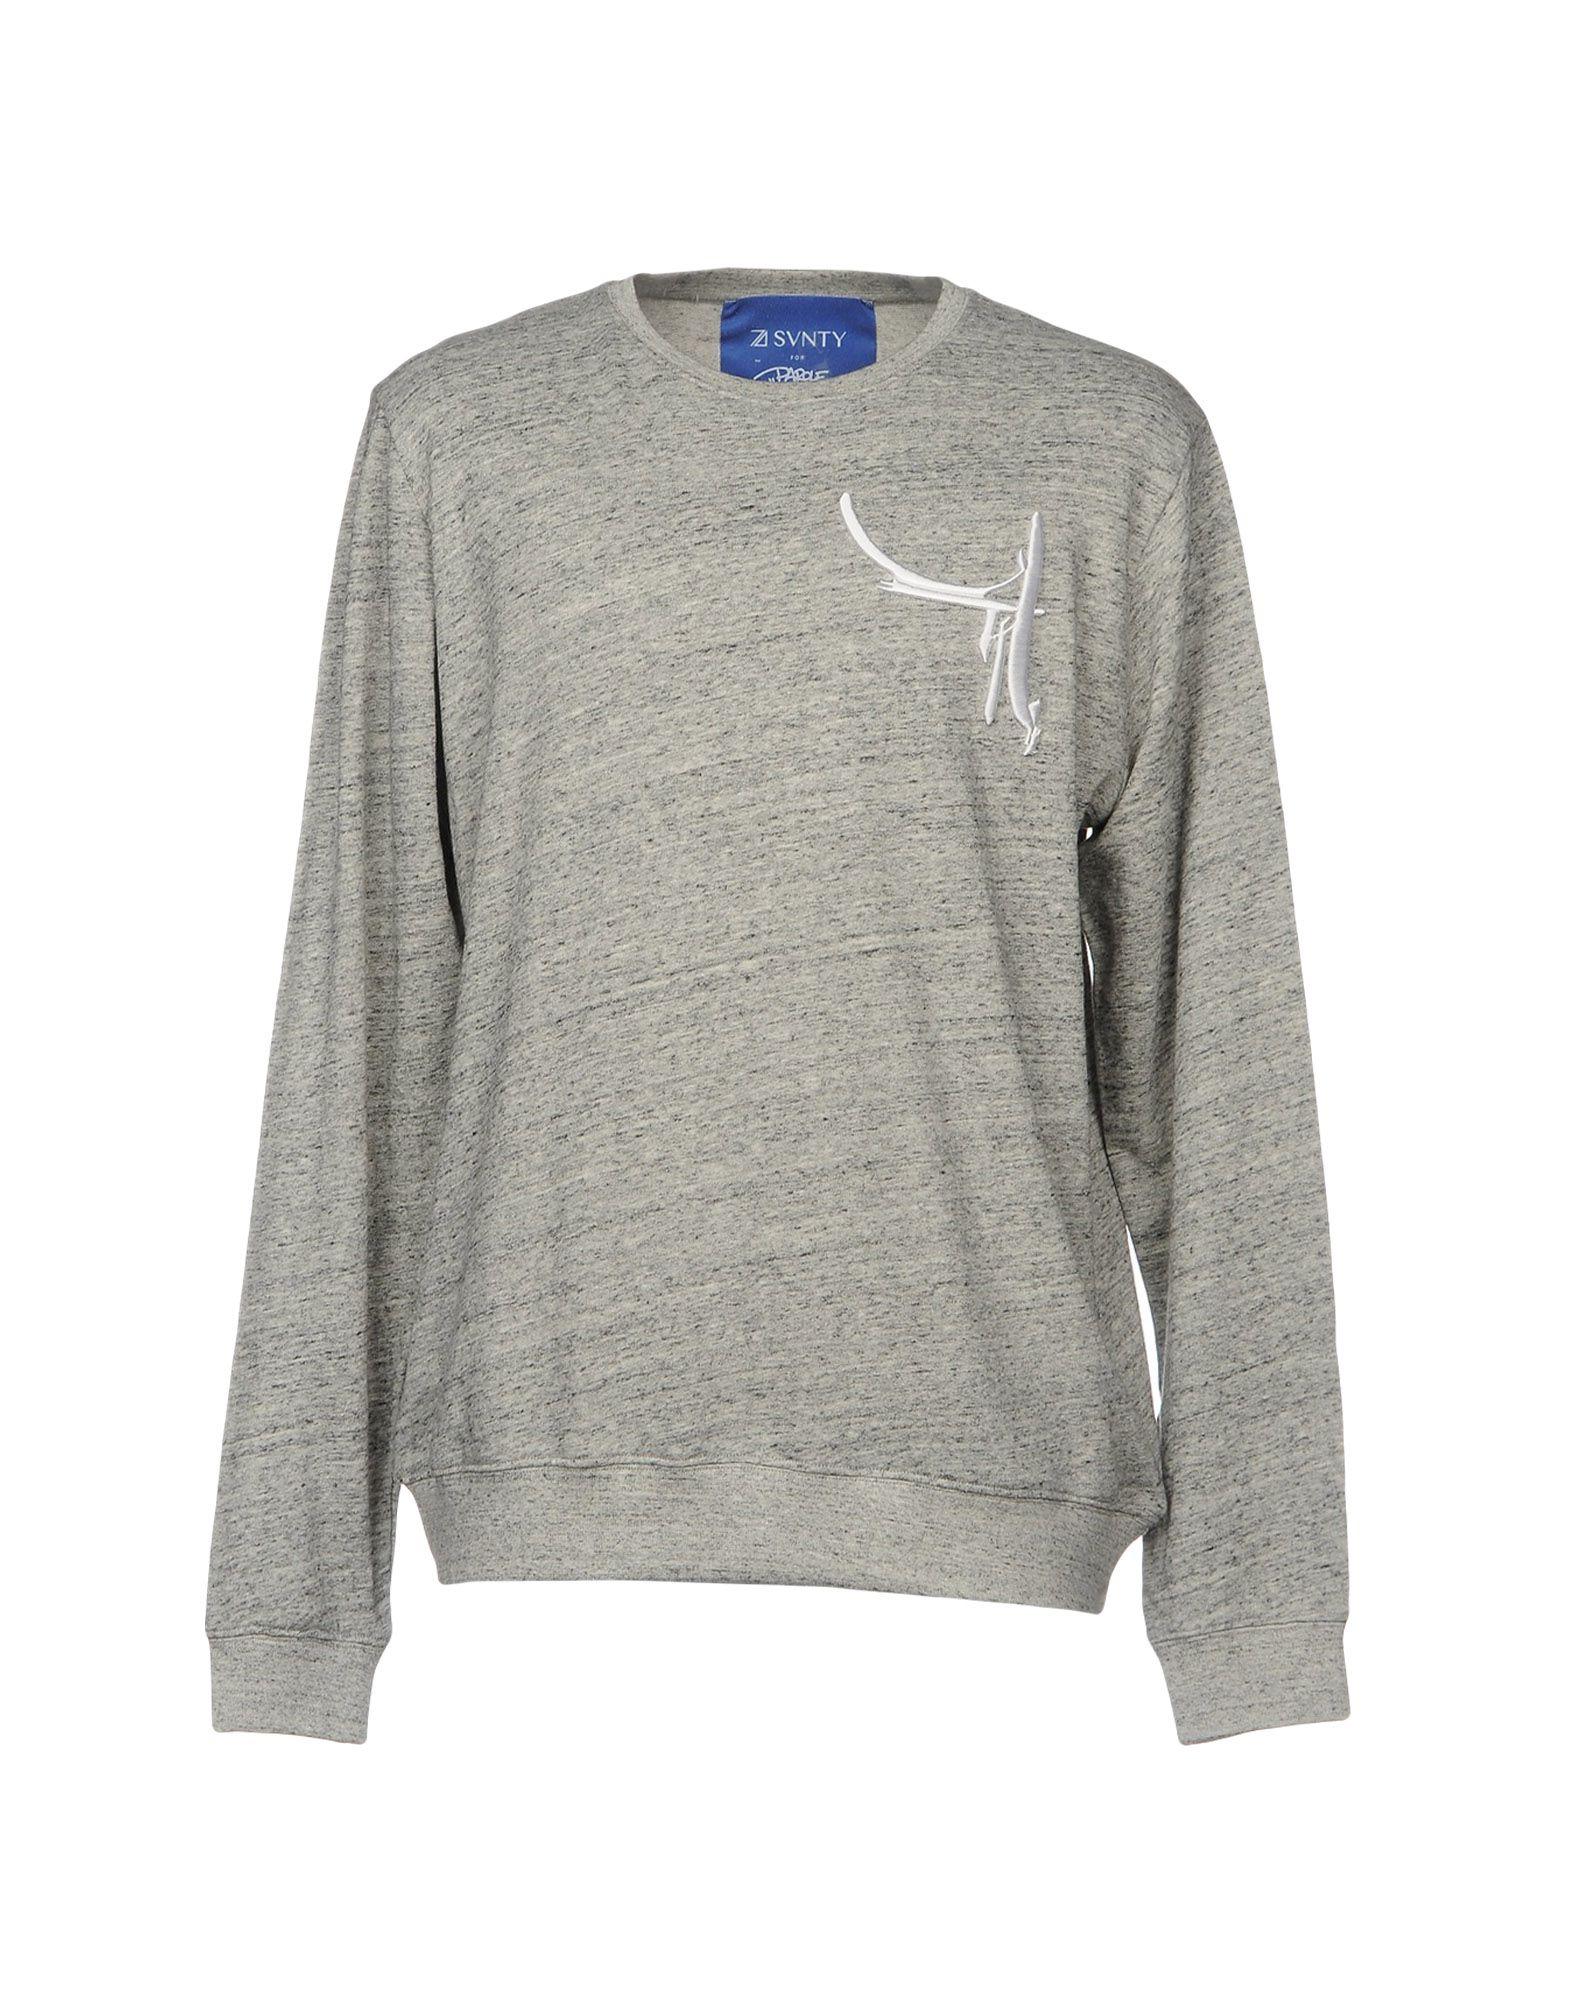 SVNTY Sweatshirt in Grey